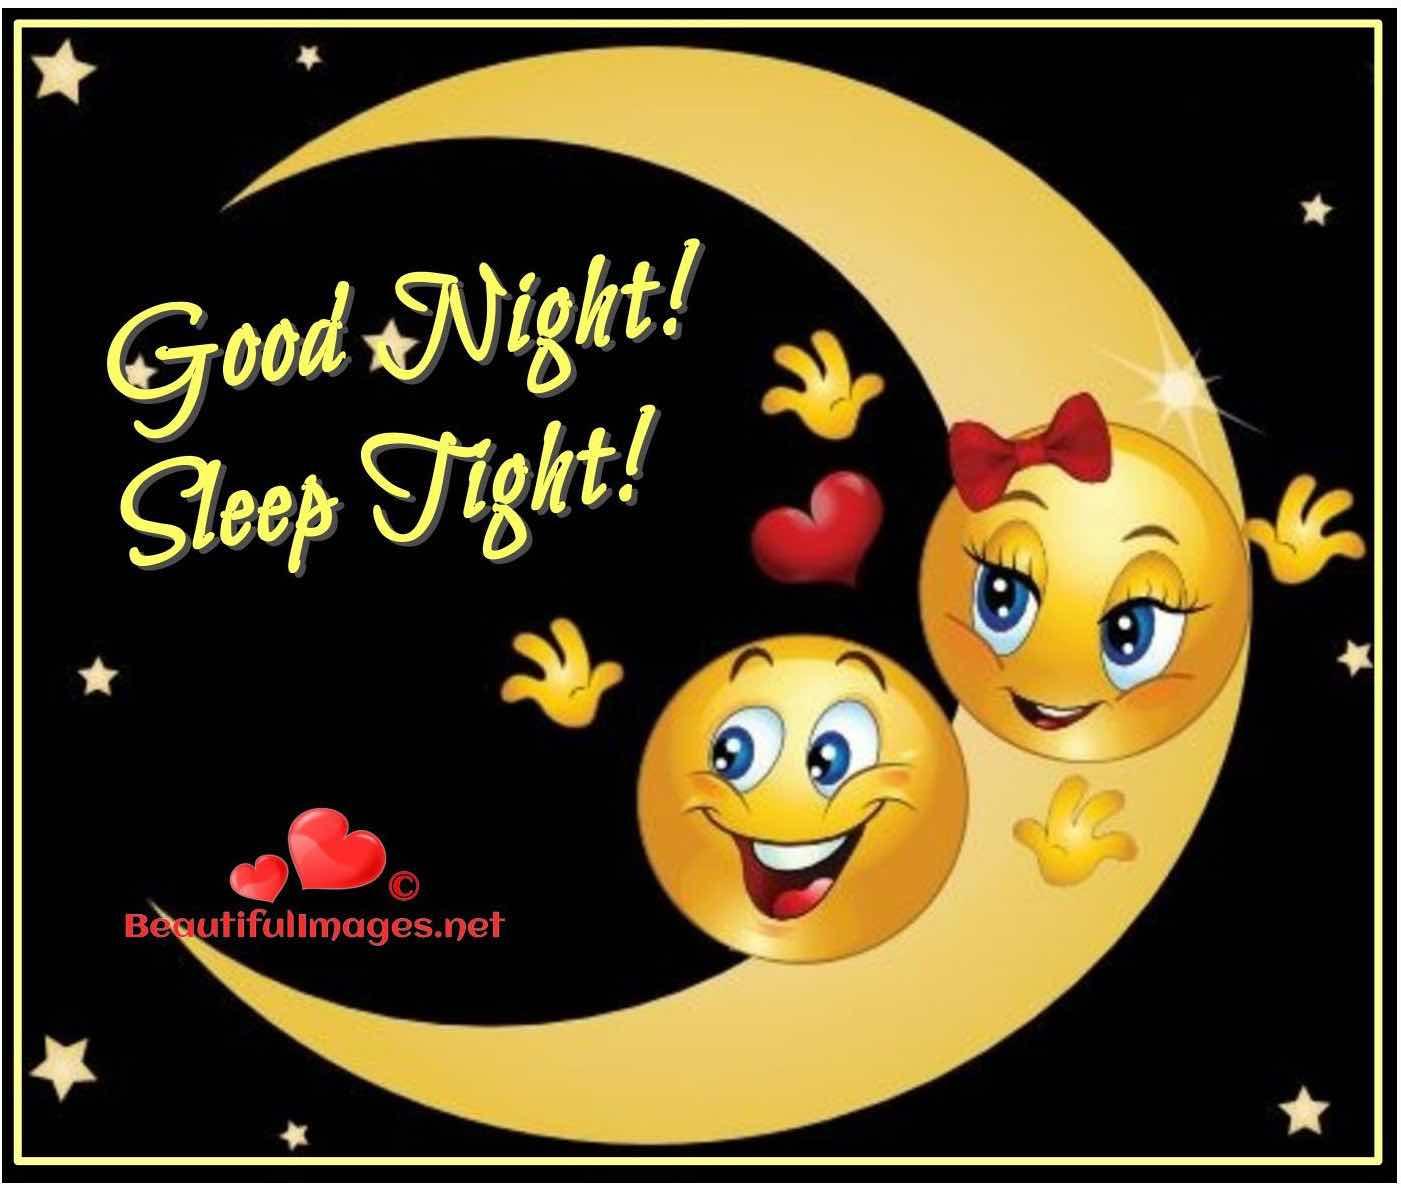 Good-Night-Beautiful-Nice-Pictures-Whatsapp